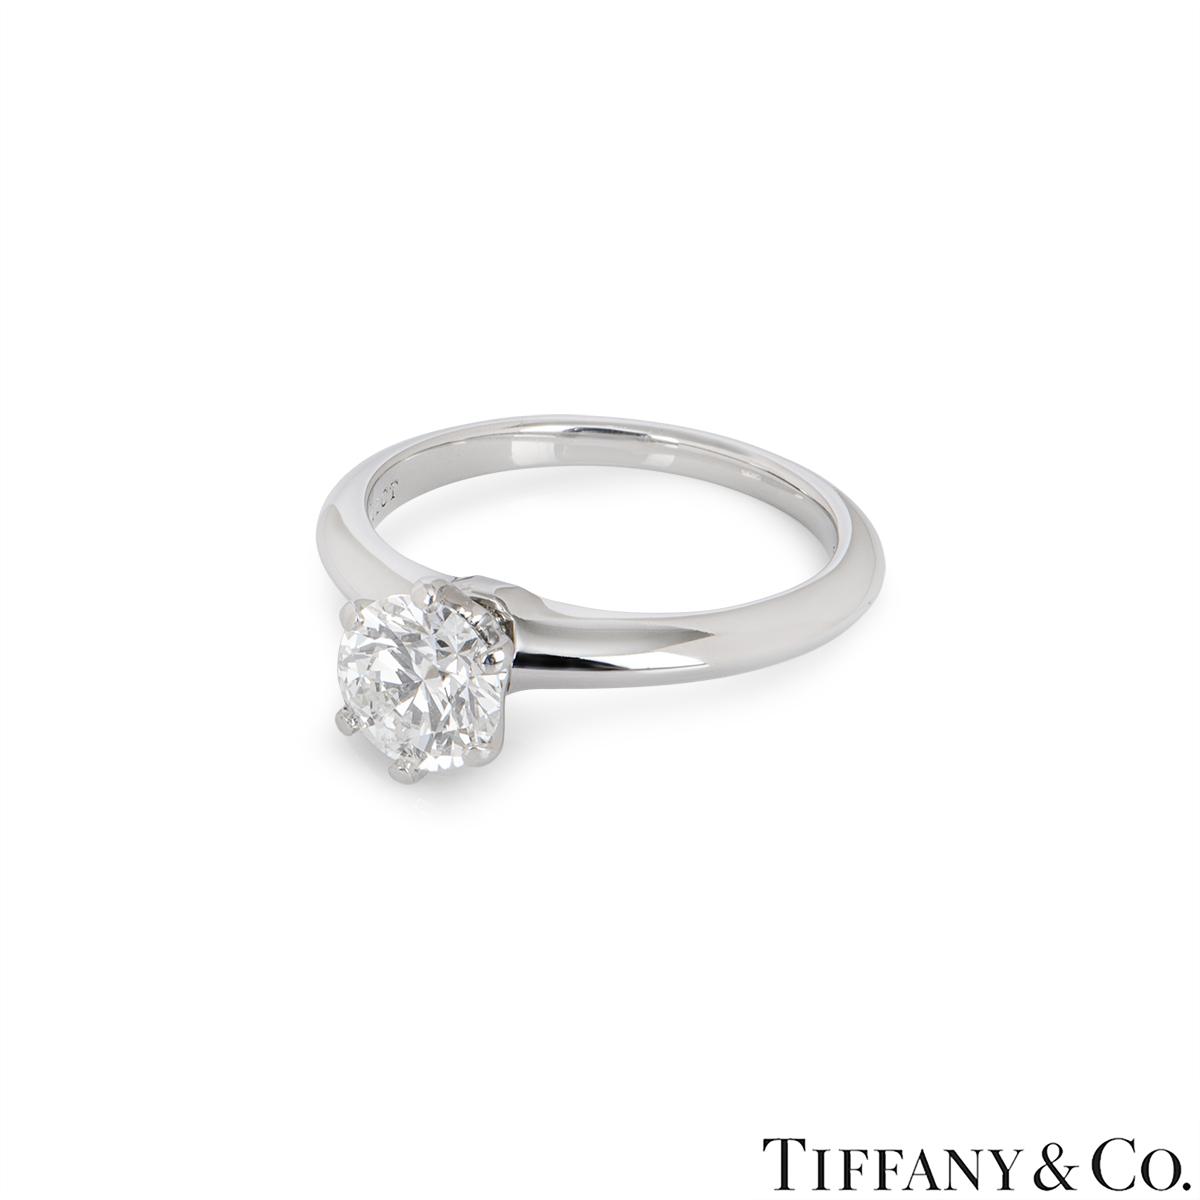 Tiffany & Co. Platinum Diamond Setting Ring 1.11ct H/VS1